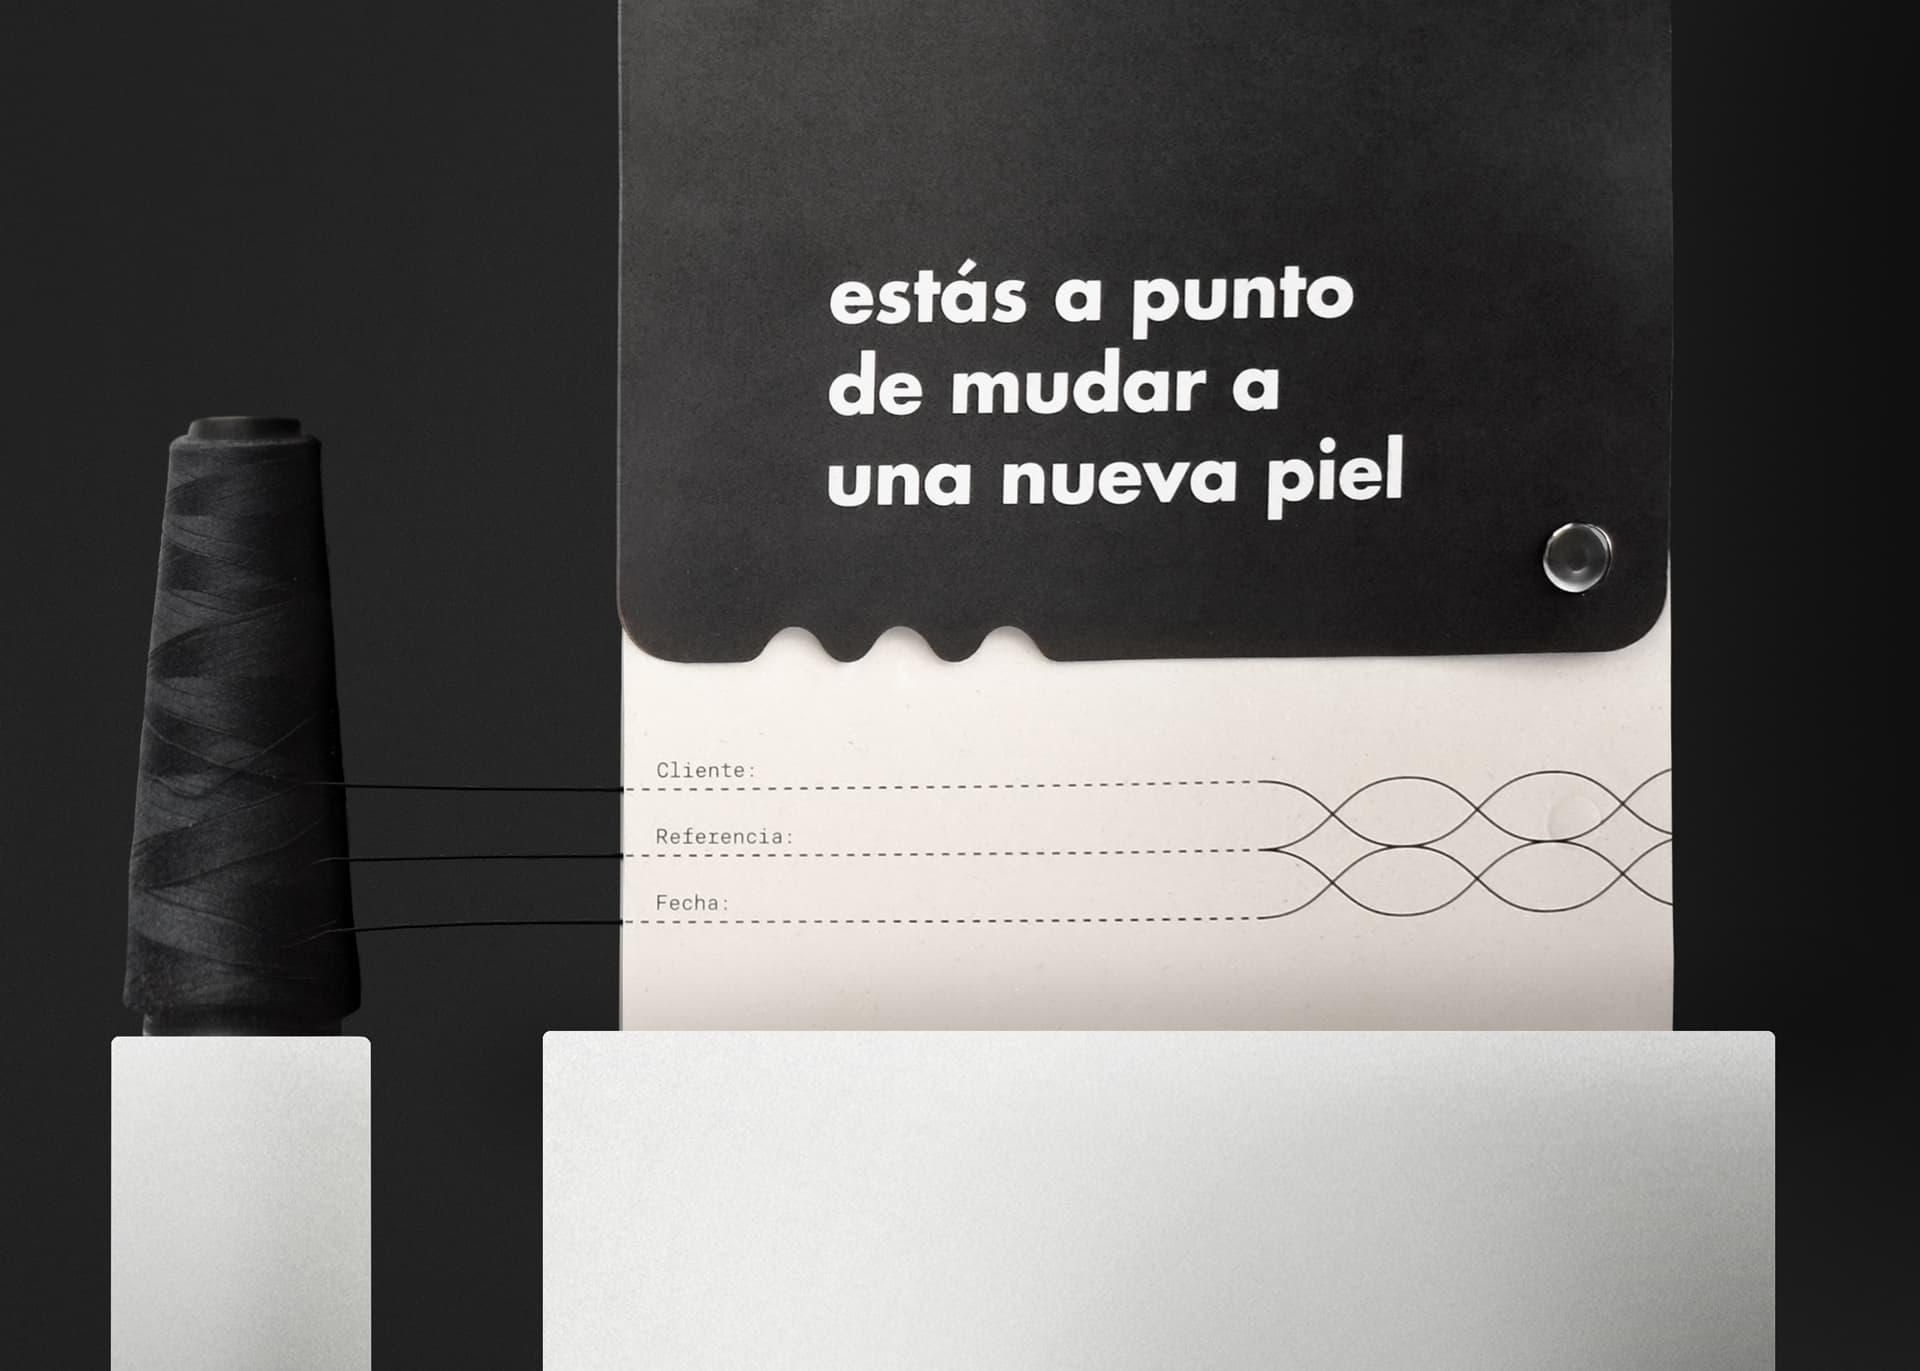 Hobby Create the Branding for Textile Workshop Mudante